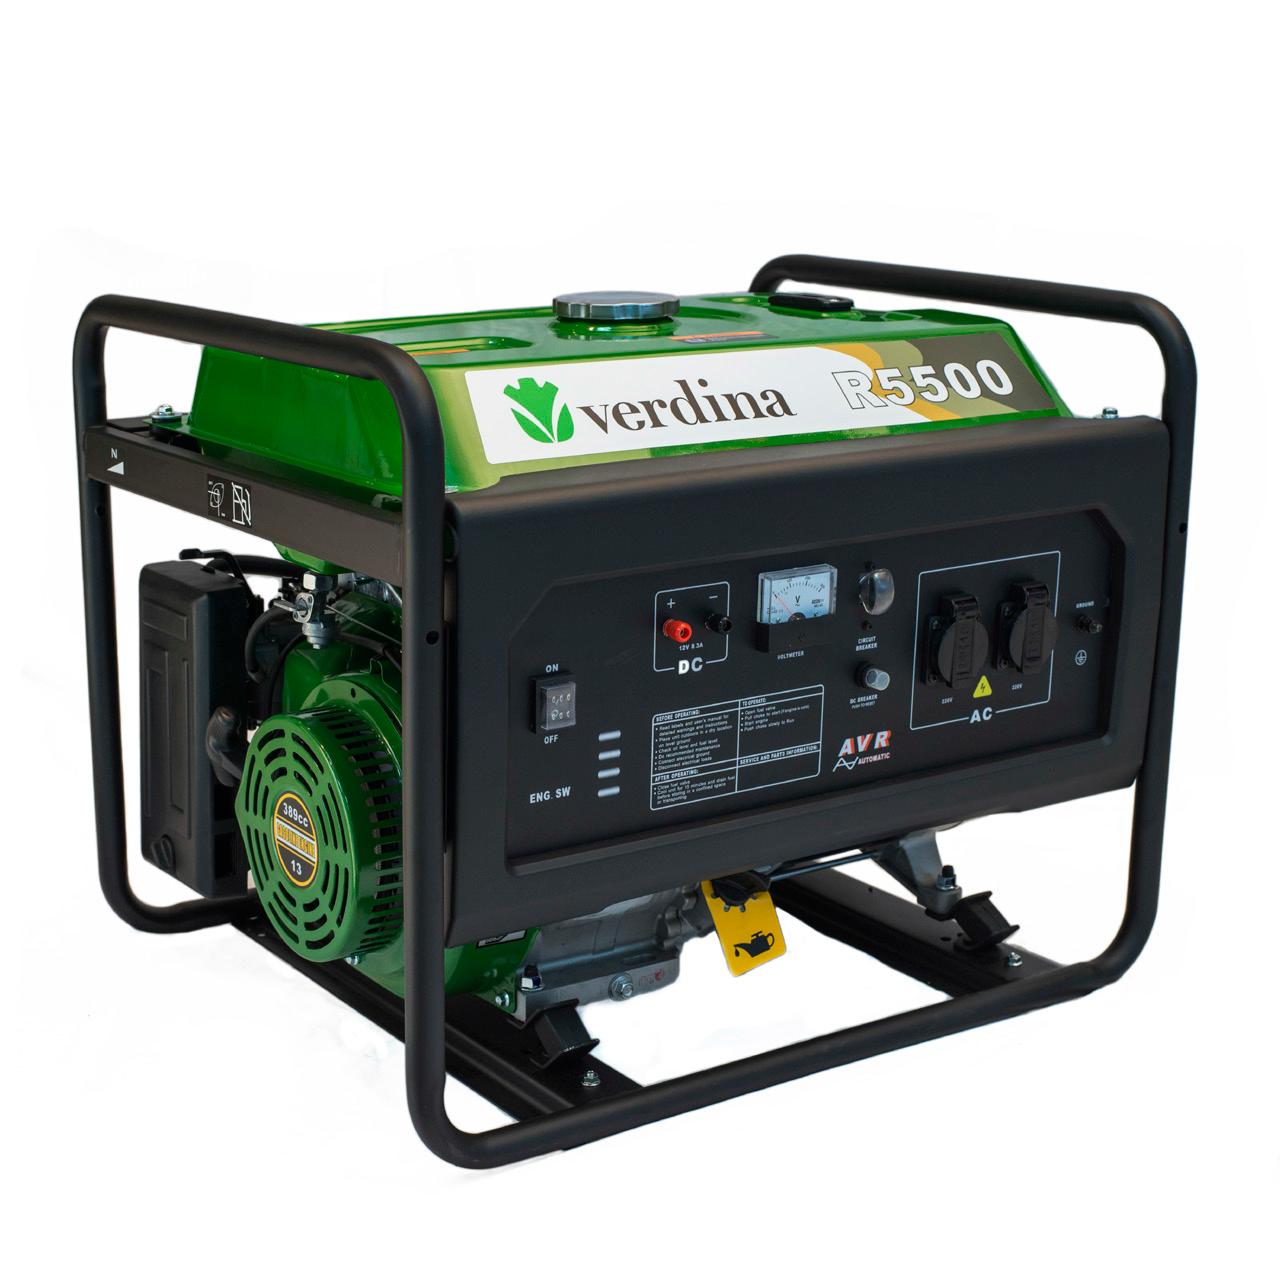 Generator Verdina R 5500